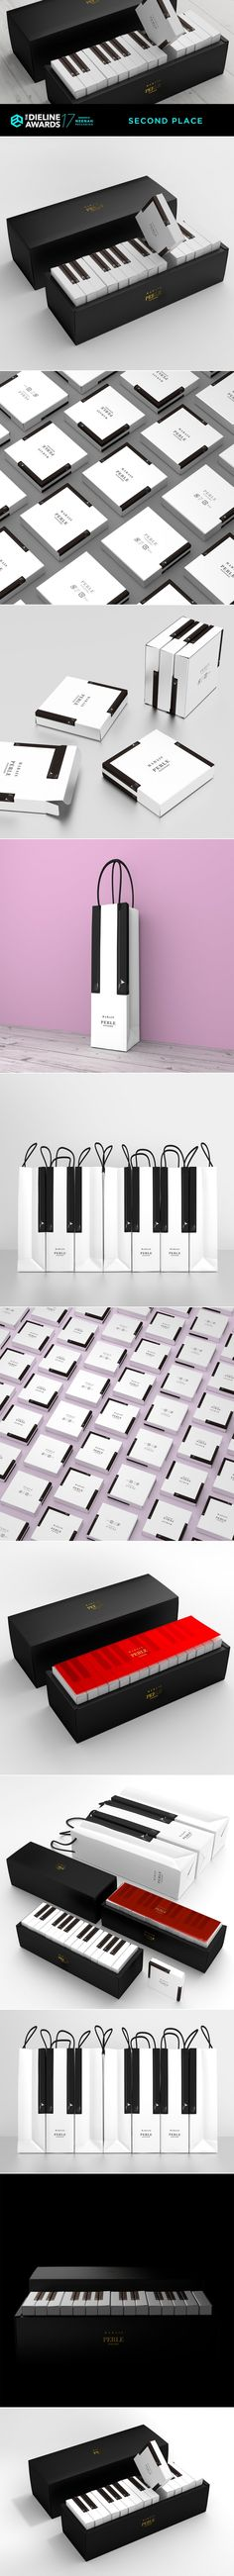 The Dieline Awards 2017: MARAIS Piano Cake Packaging — The Dieline | Packaging & Branding Design & Innovation News